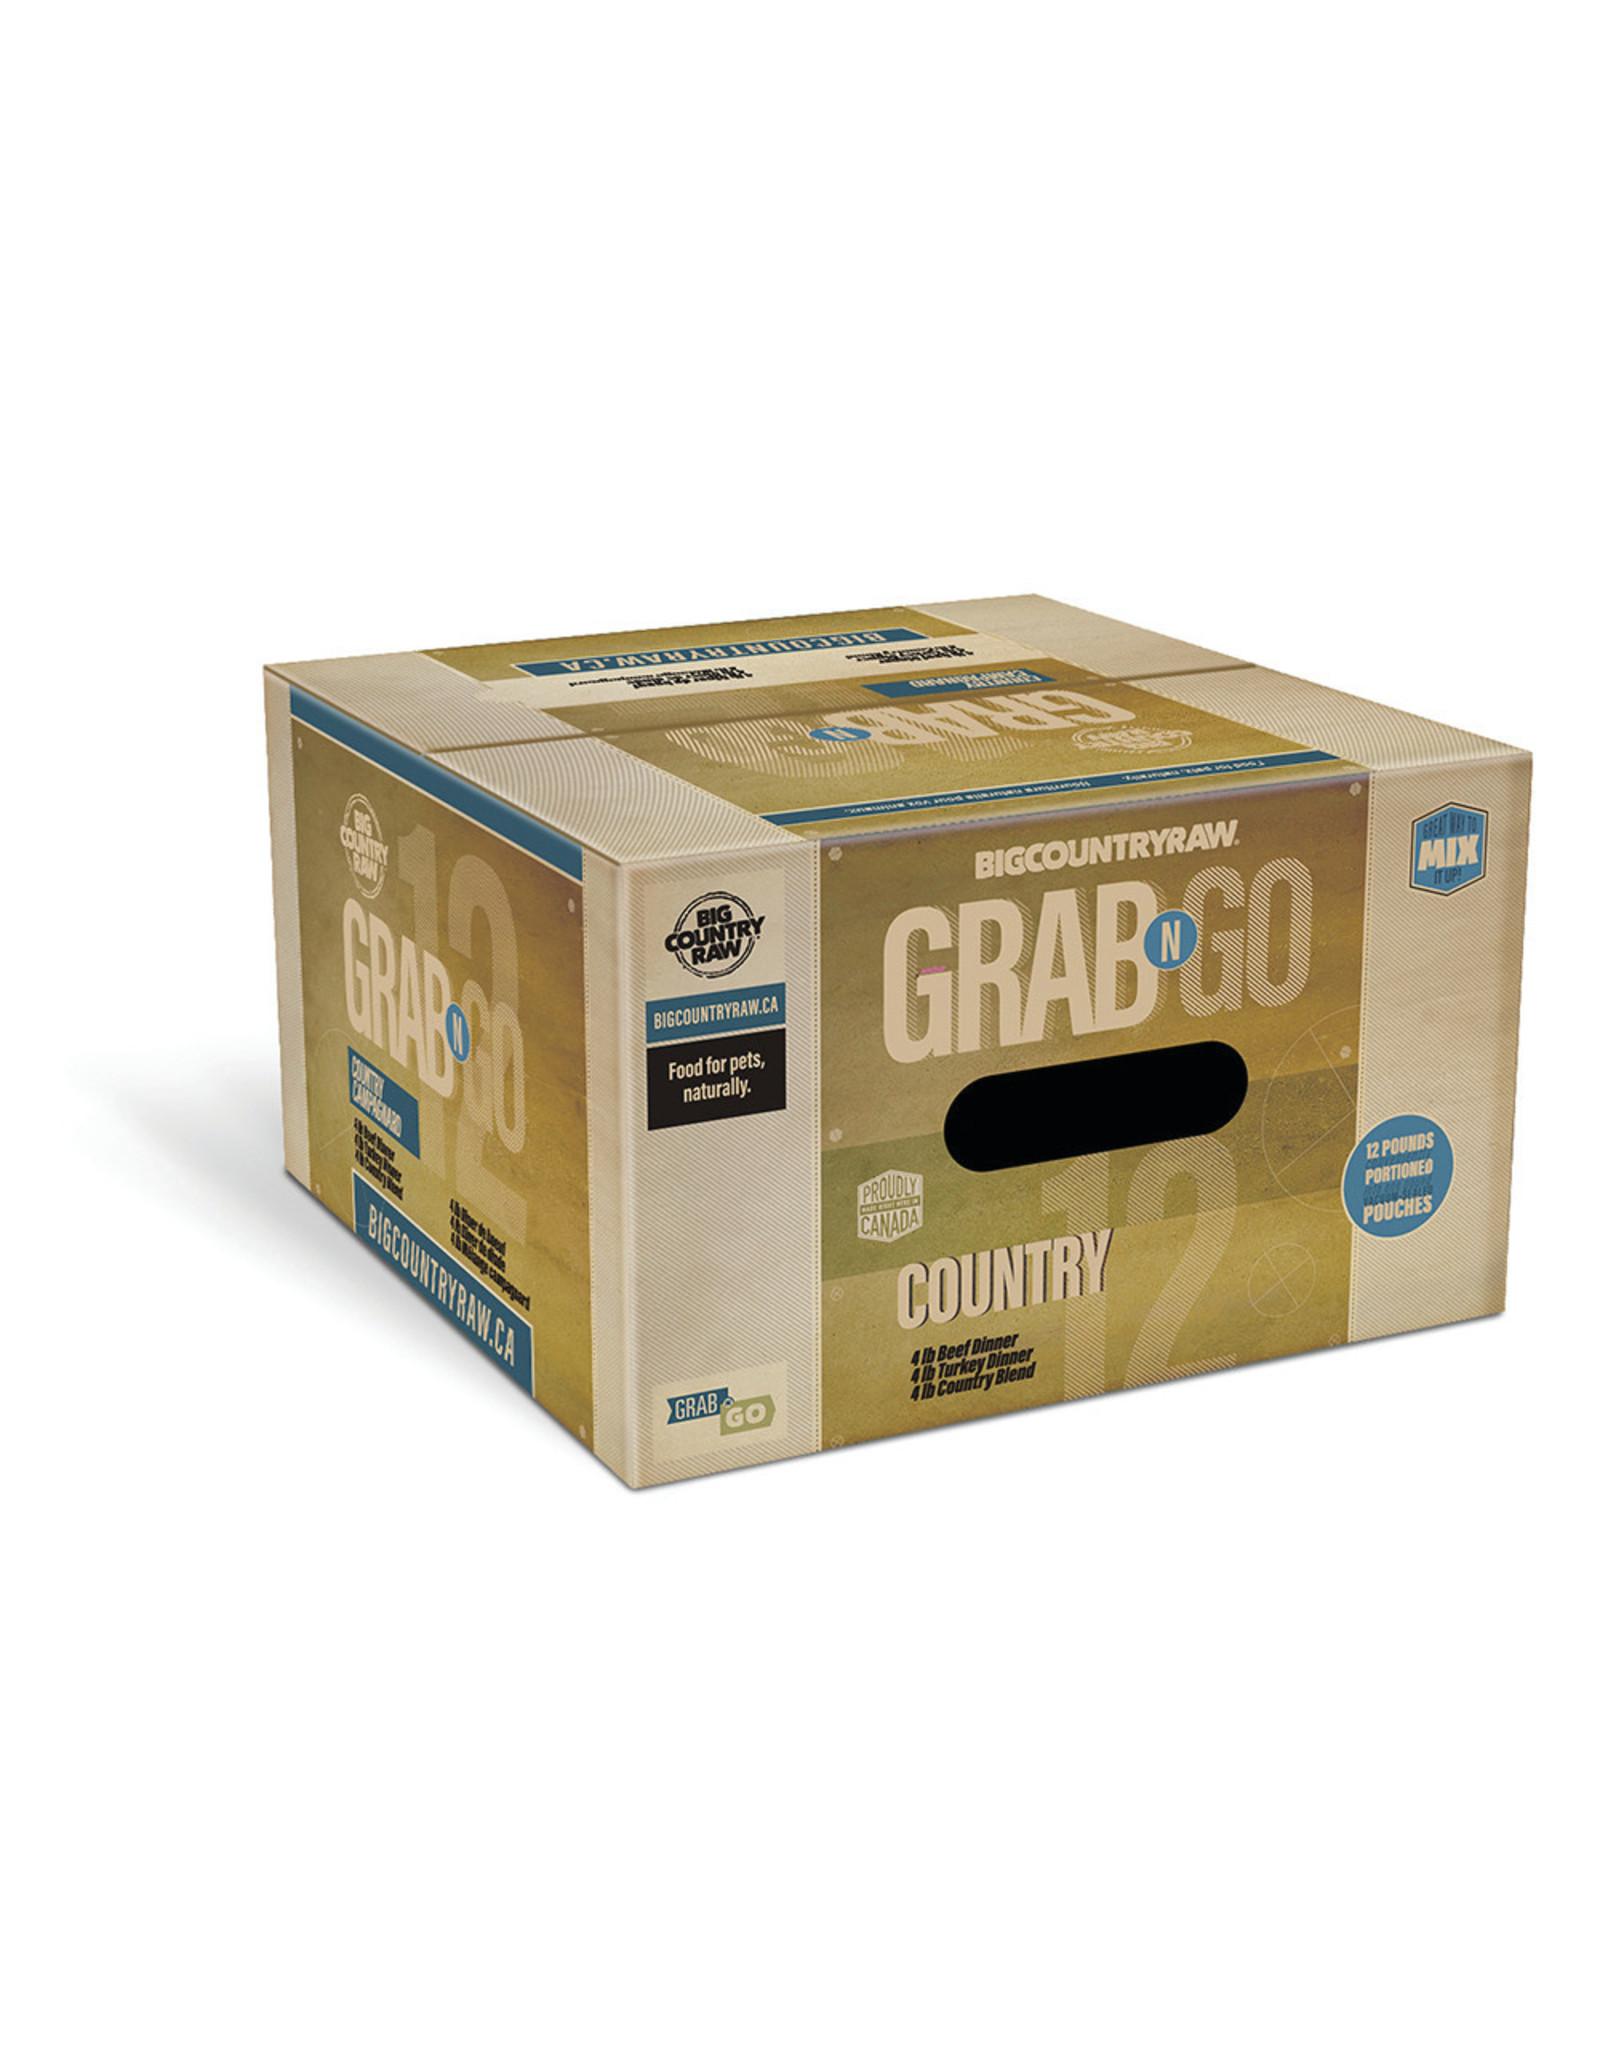 BCR BCR 12lb Mini Grab N Go Country Deal